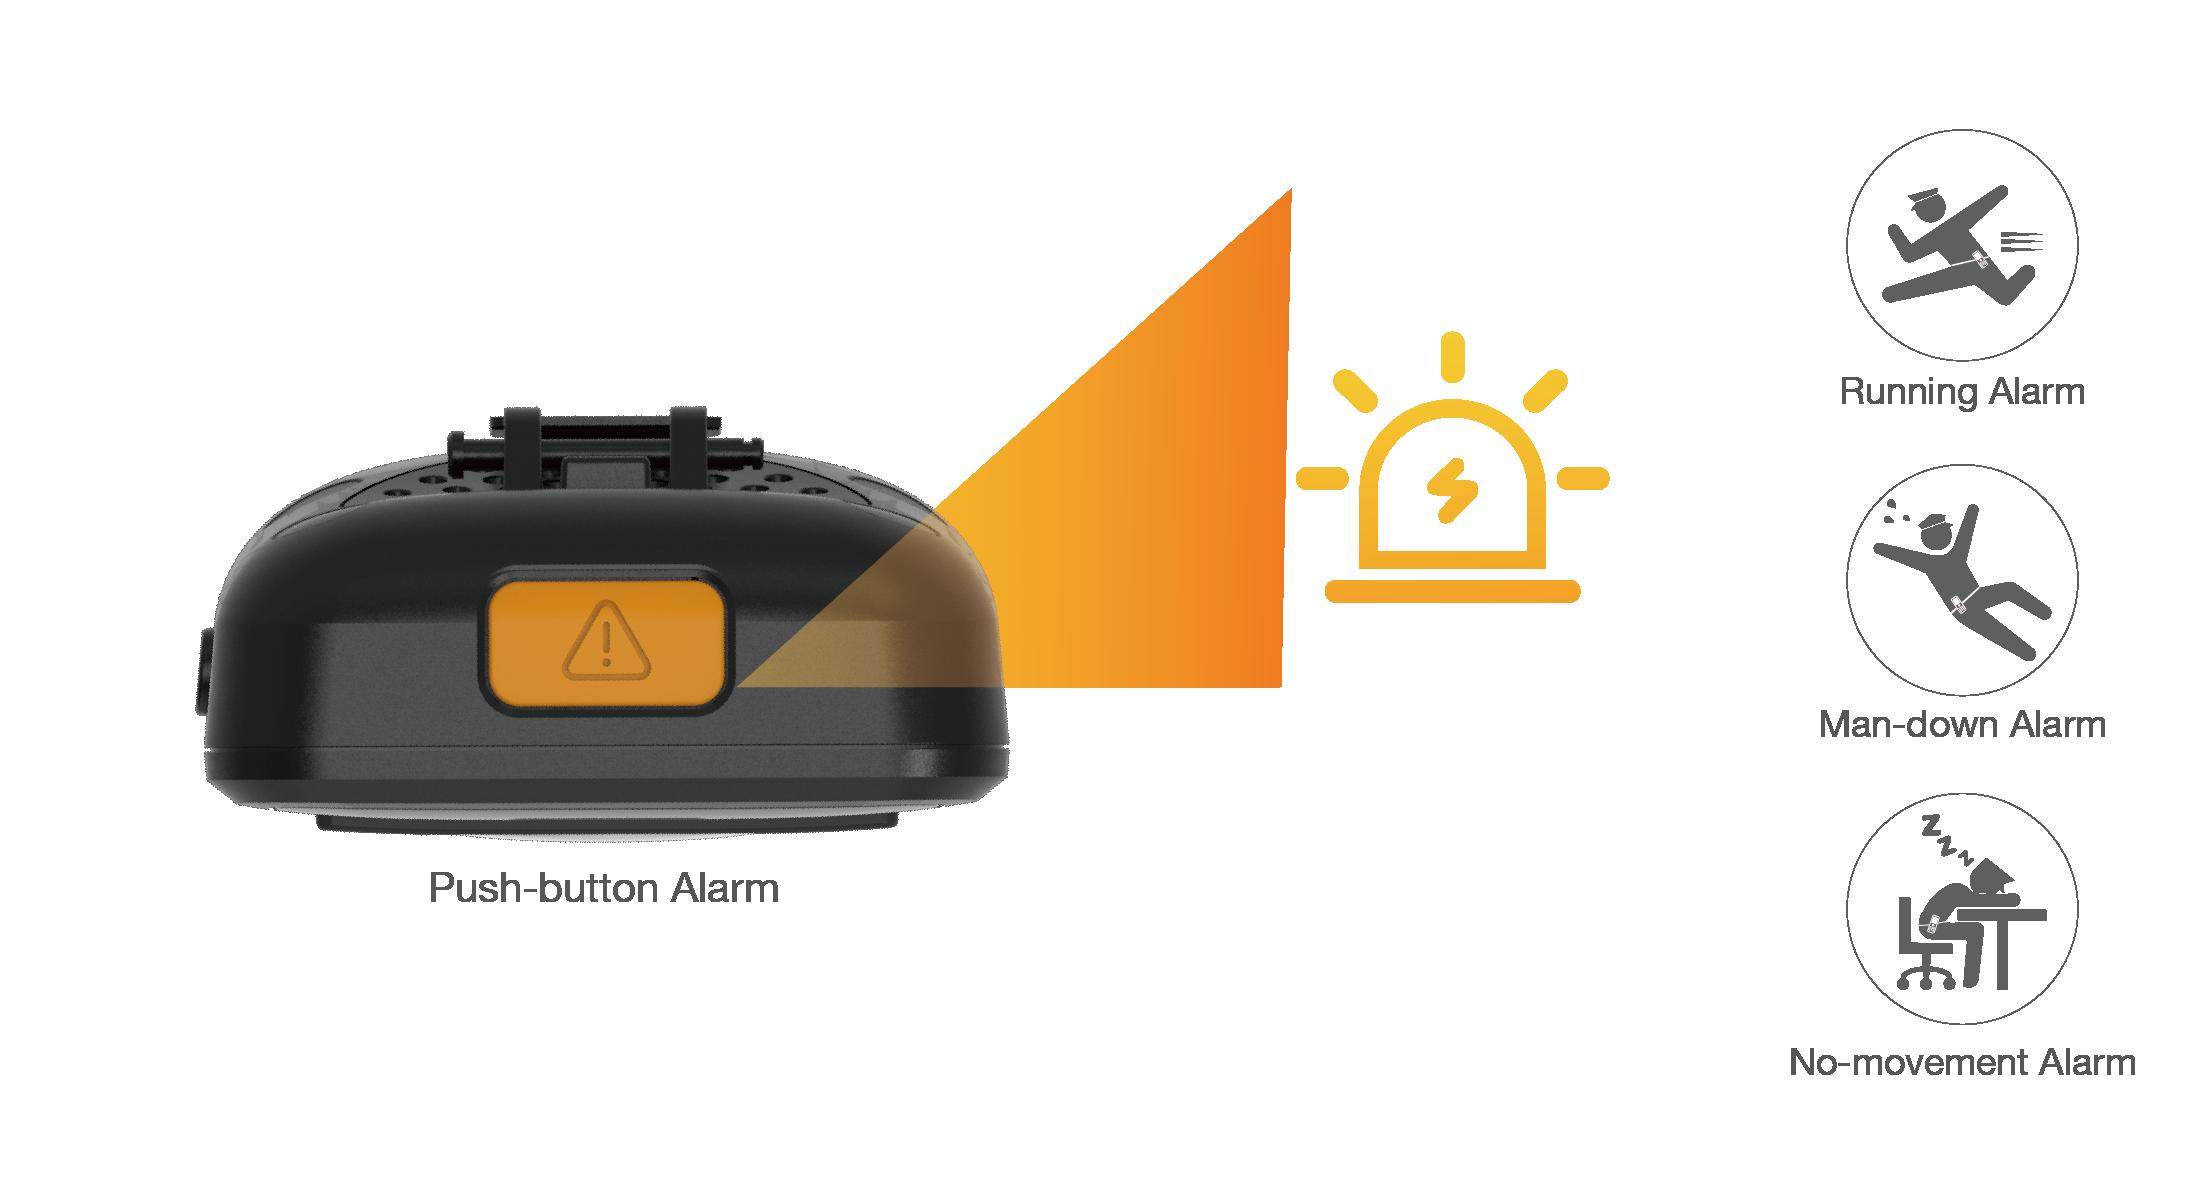 Yealink W59R Ruggedized DECT Handset